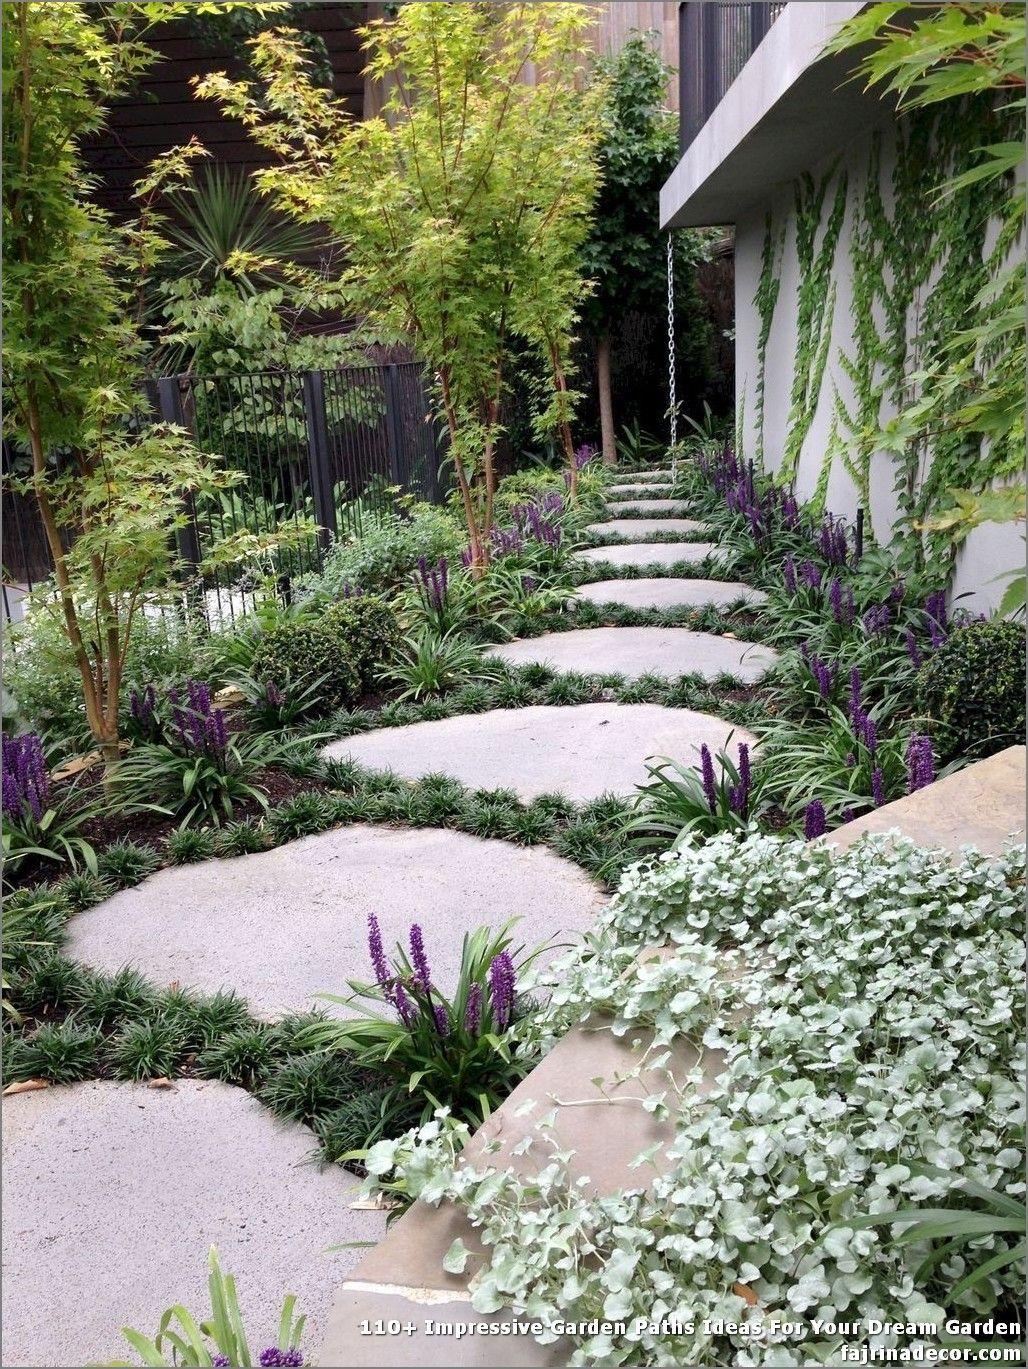 Photo of 110+ Impressive Garden Paths Ideas For Your Dream Garden – Best Home Decoratin…